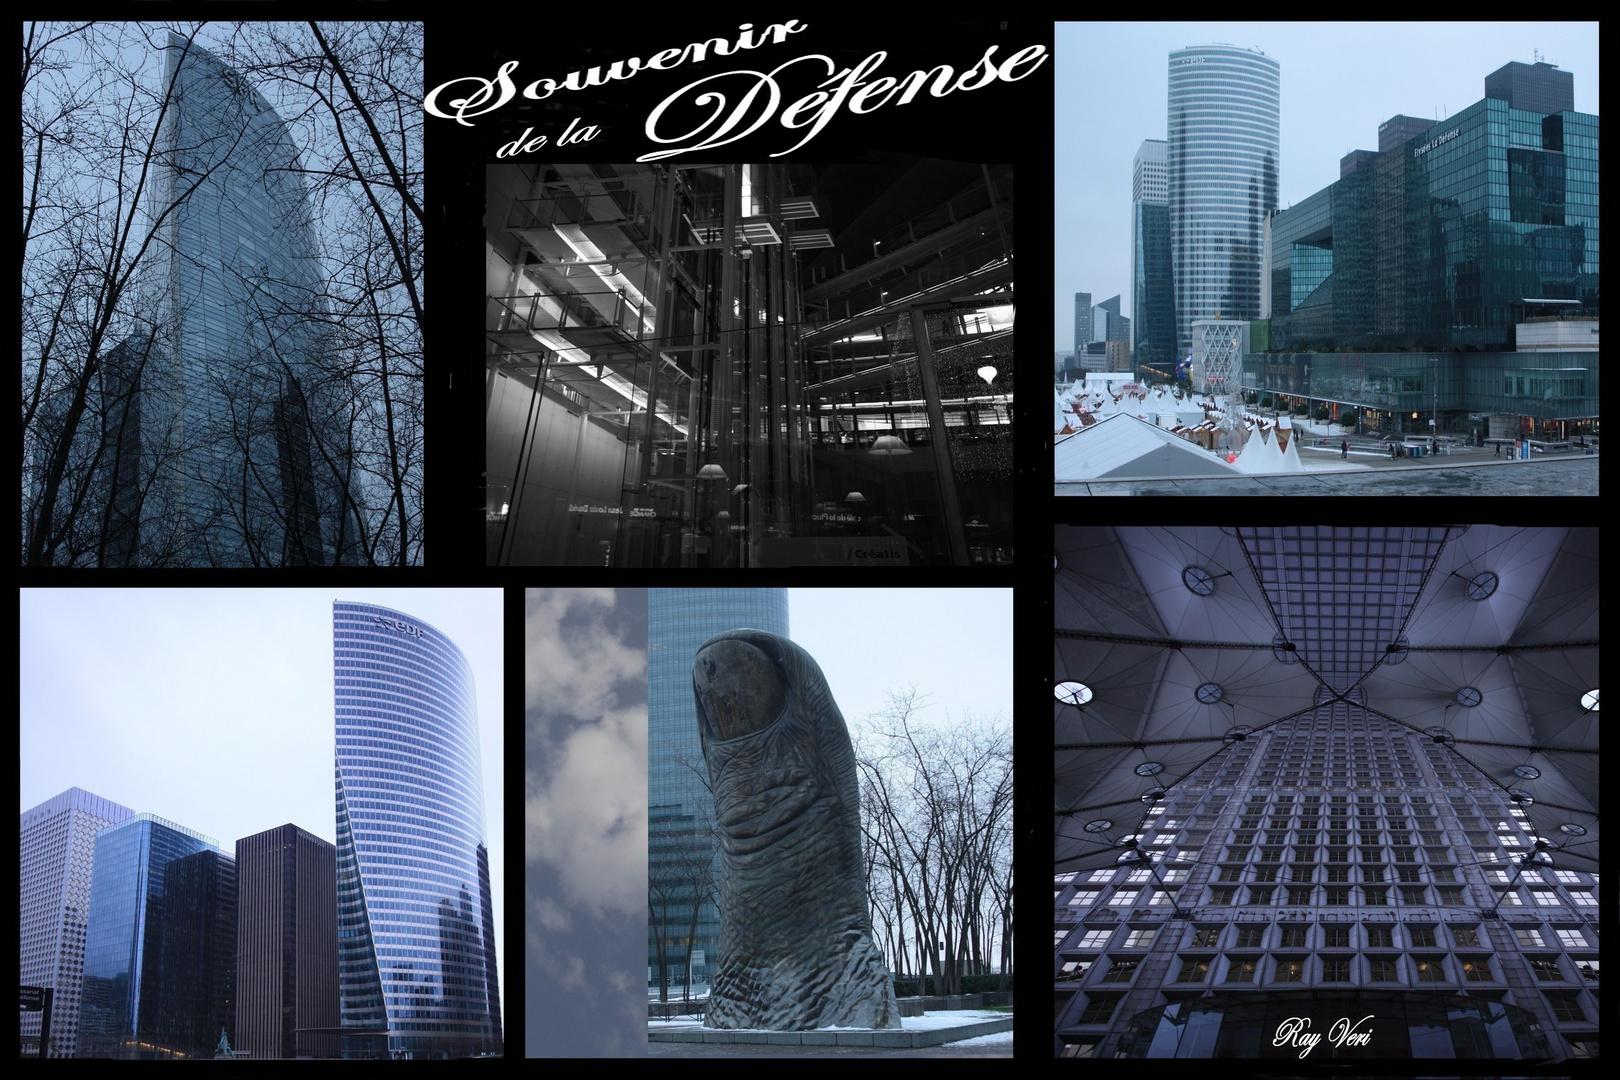 Souvenir de la Défense